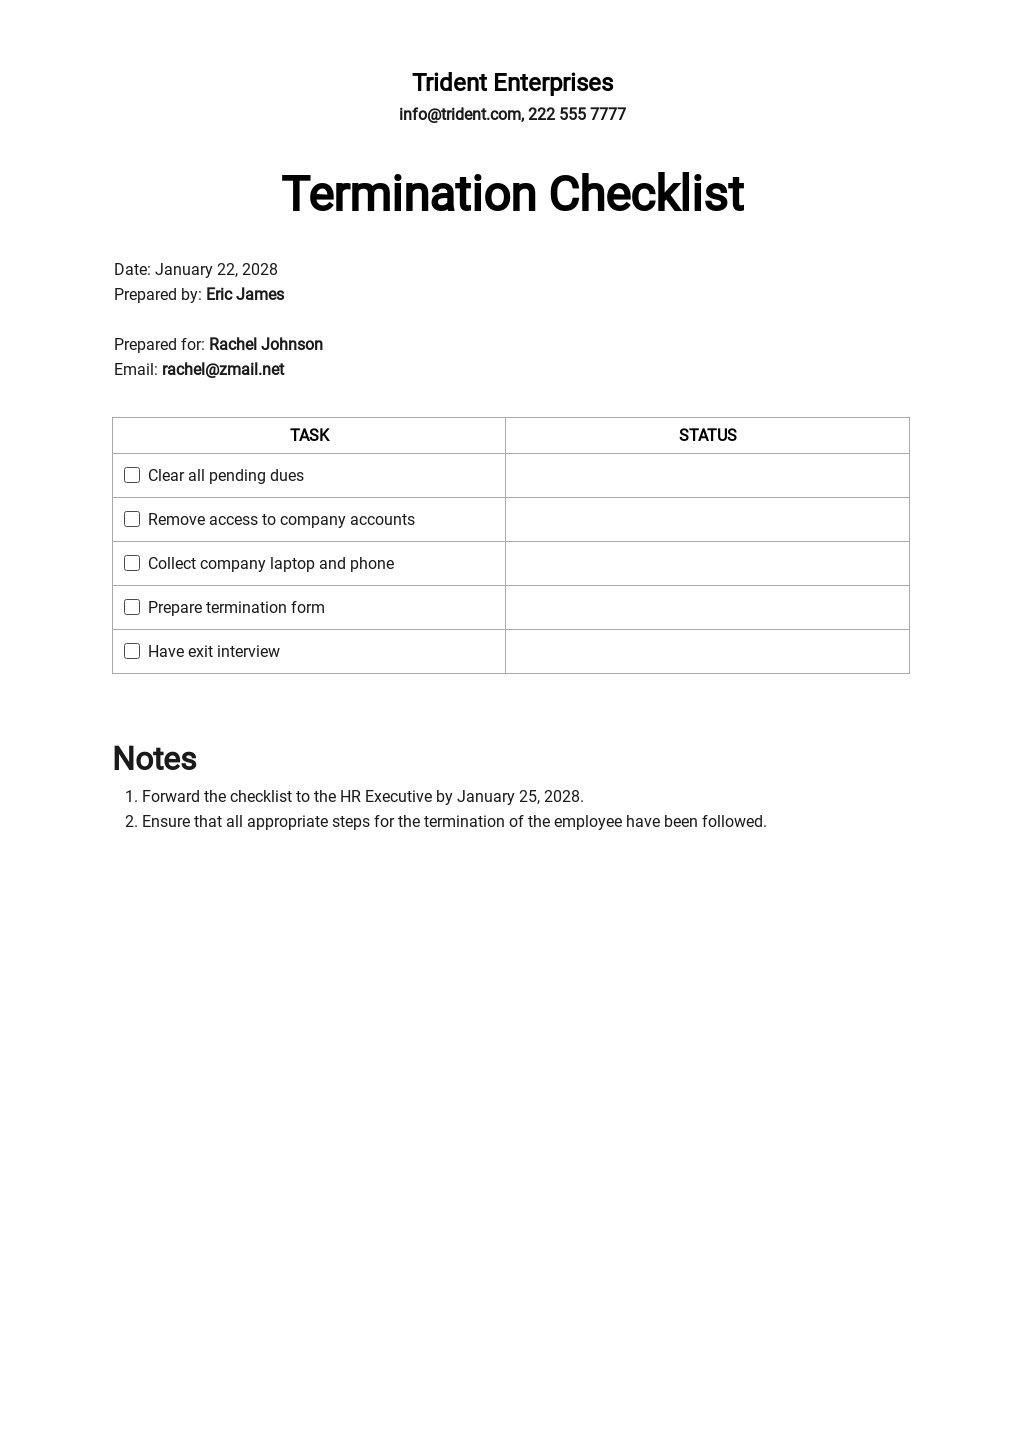 Free Termination Checklist Template